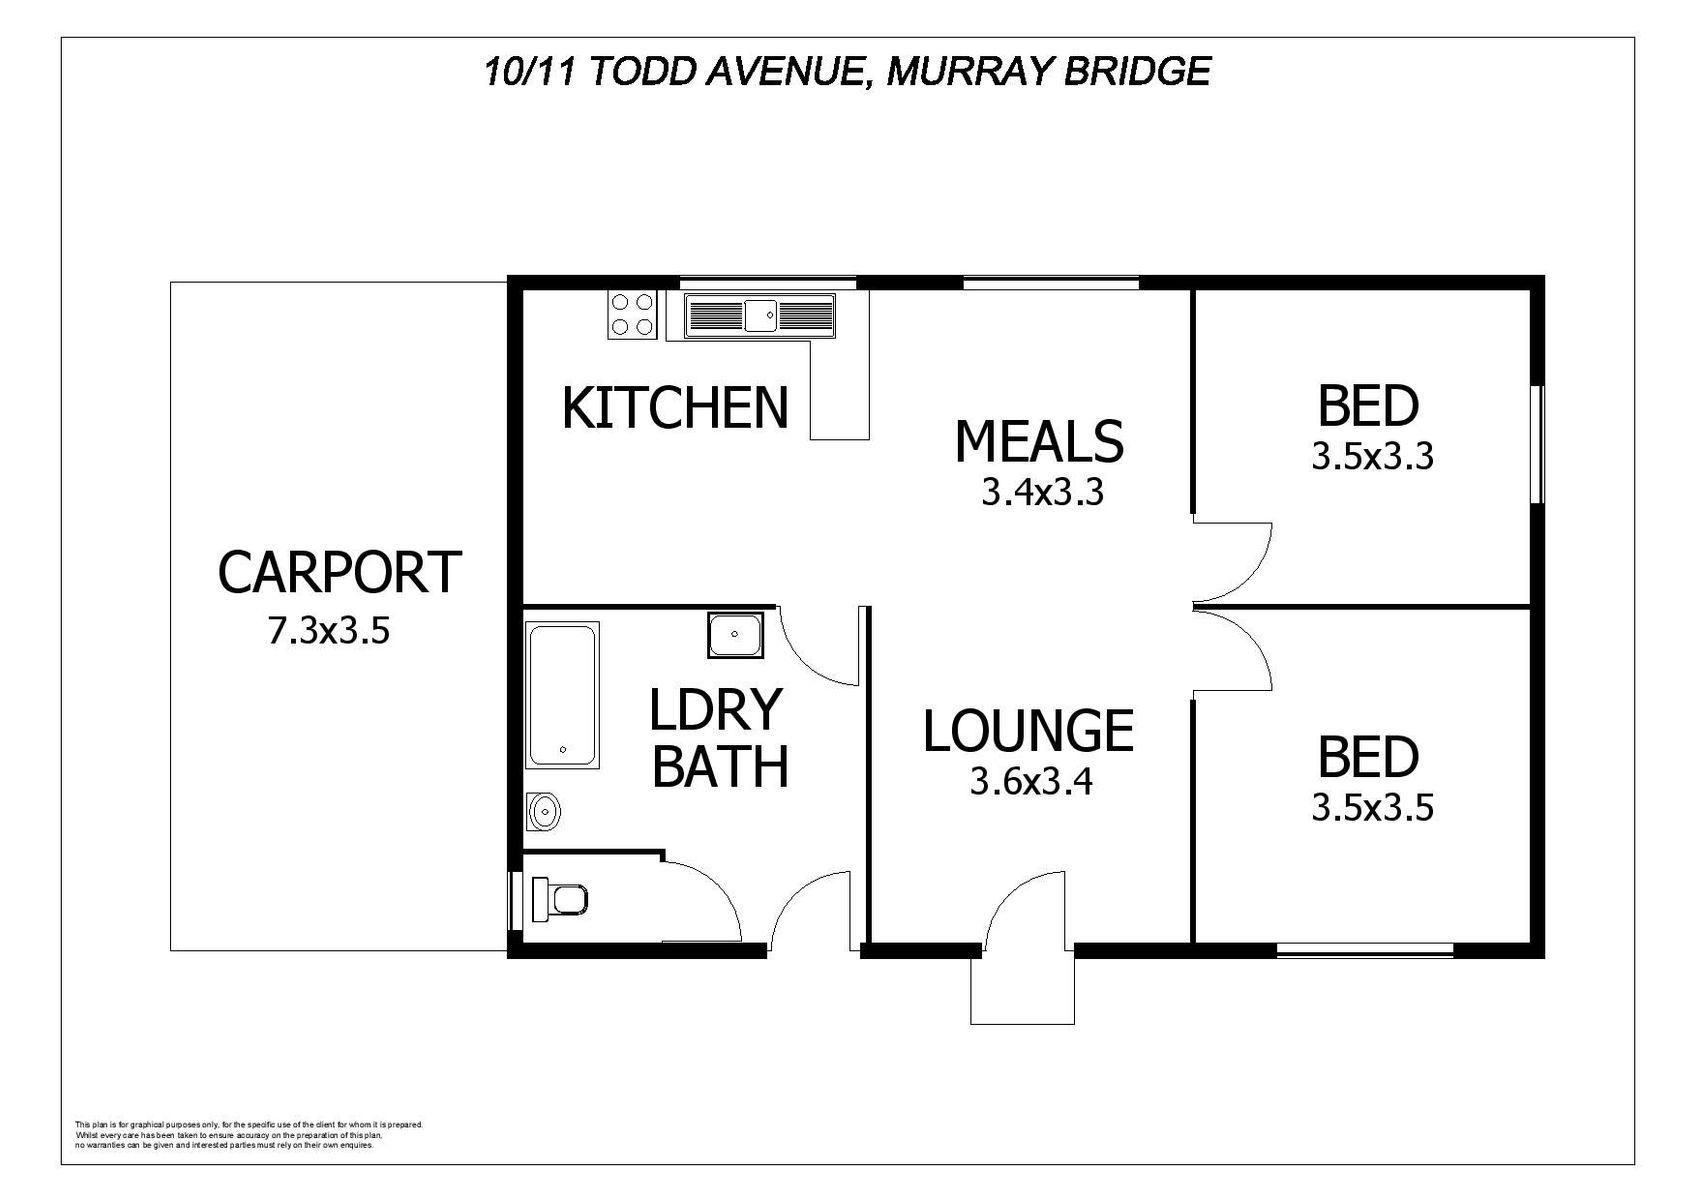 11 Todd Avenue, Murray Bridge, SA 5253